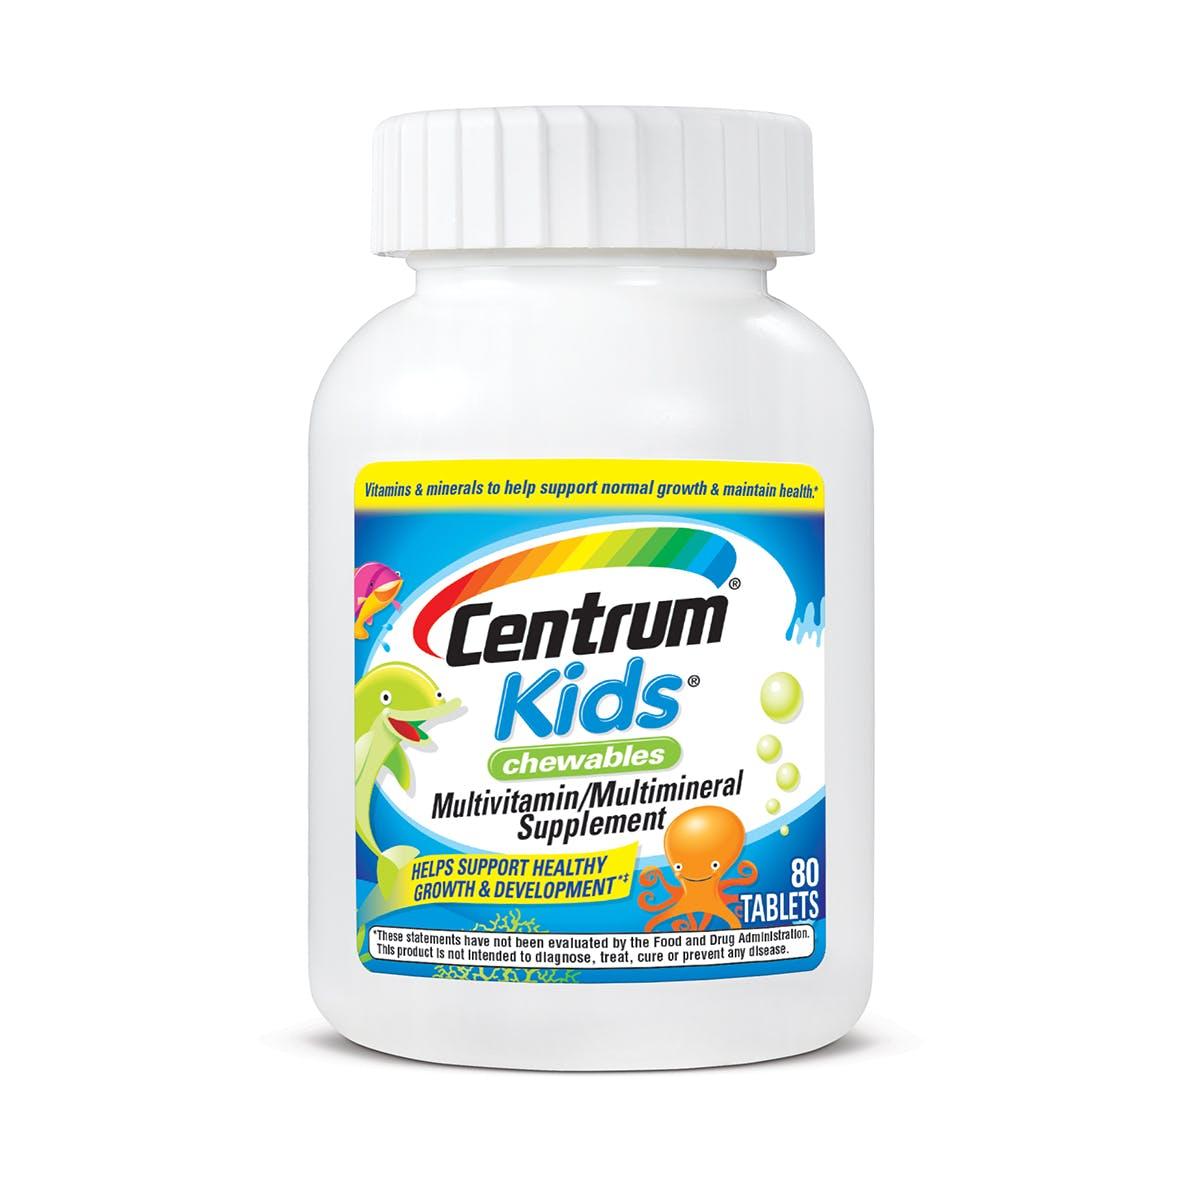 Bottle of Centrum Kids multivitamins